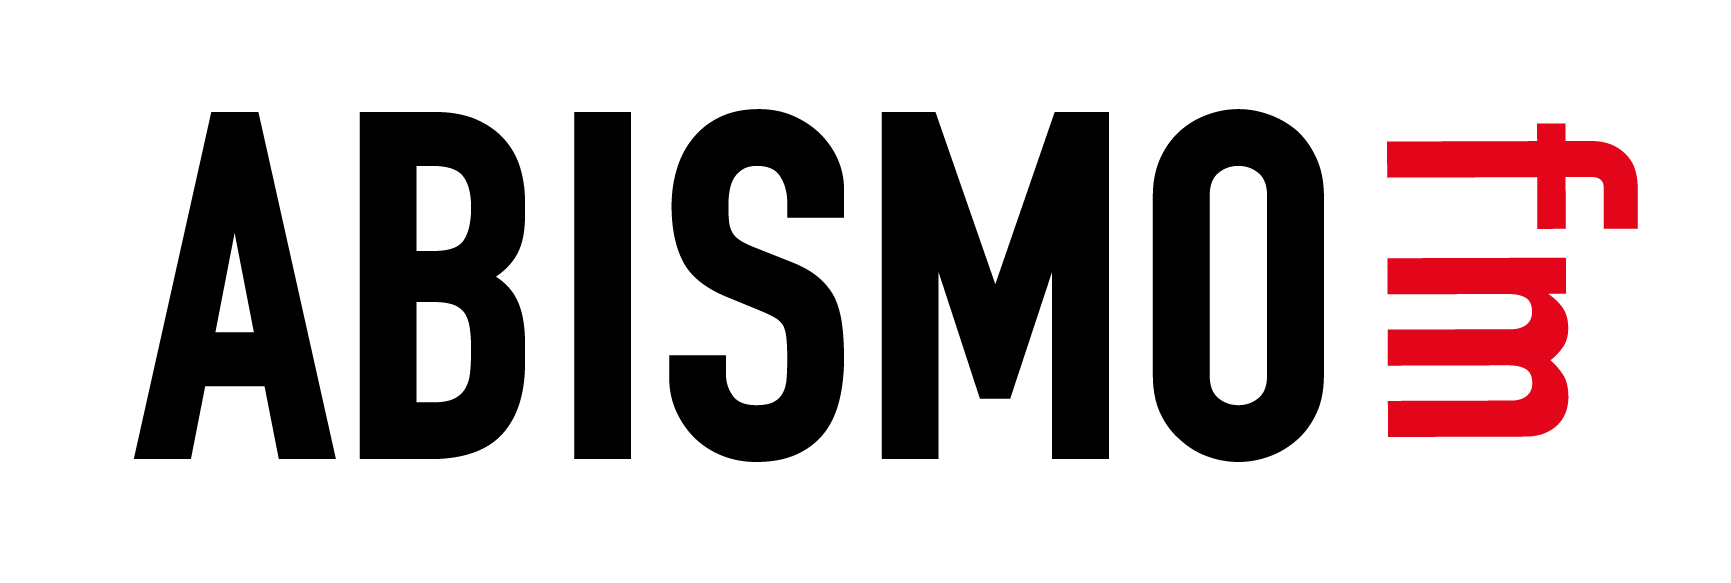 Abismofm logo